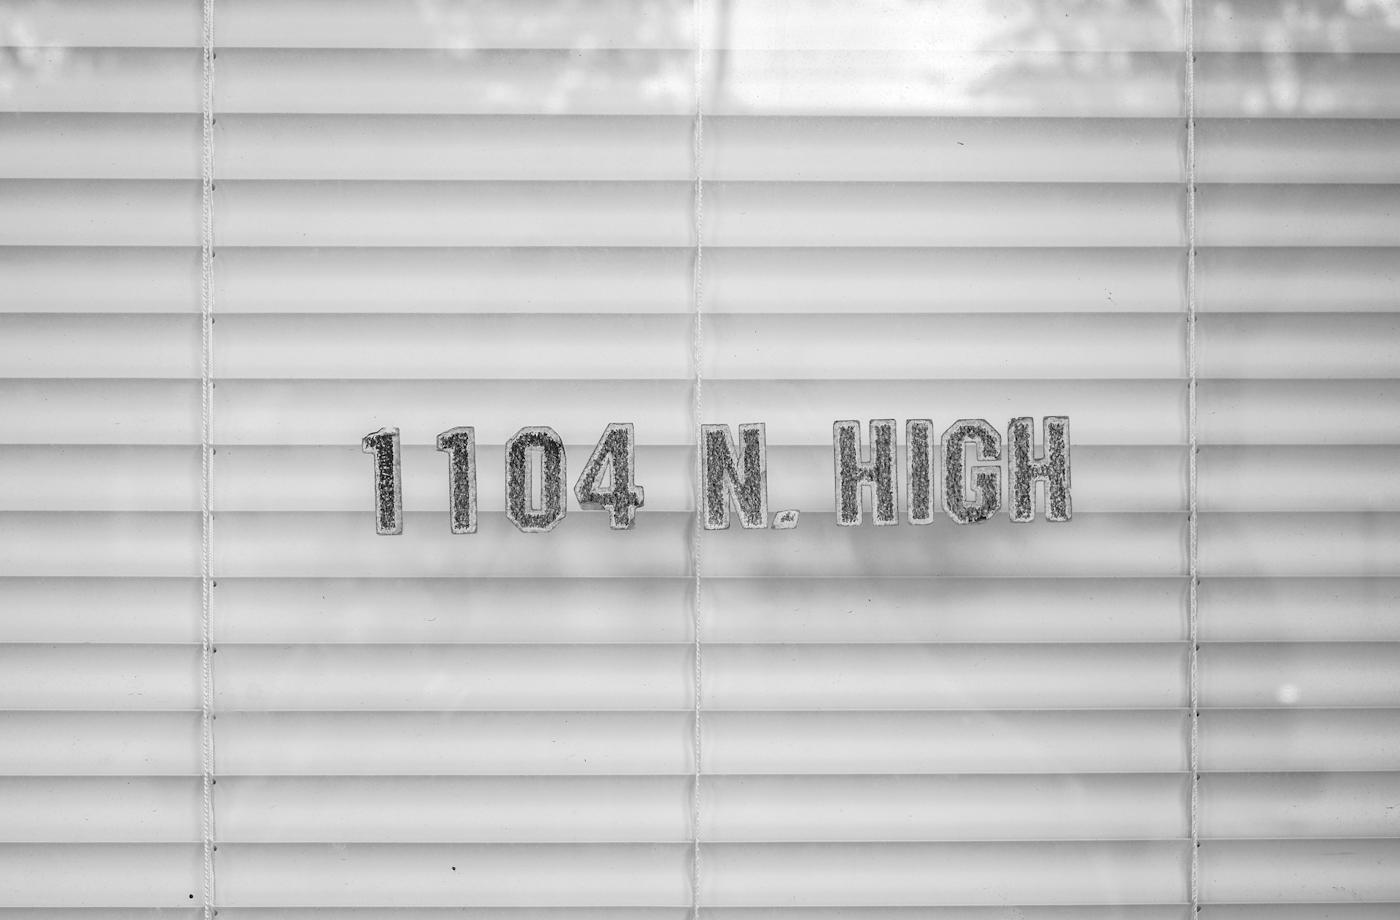 1104 N High